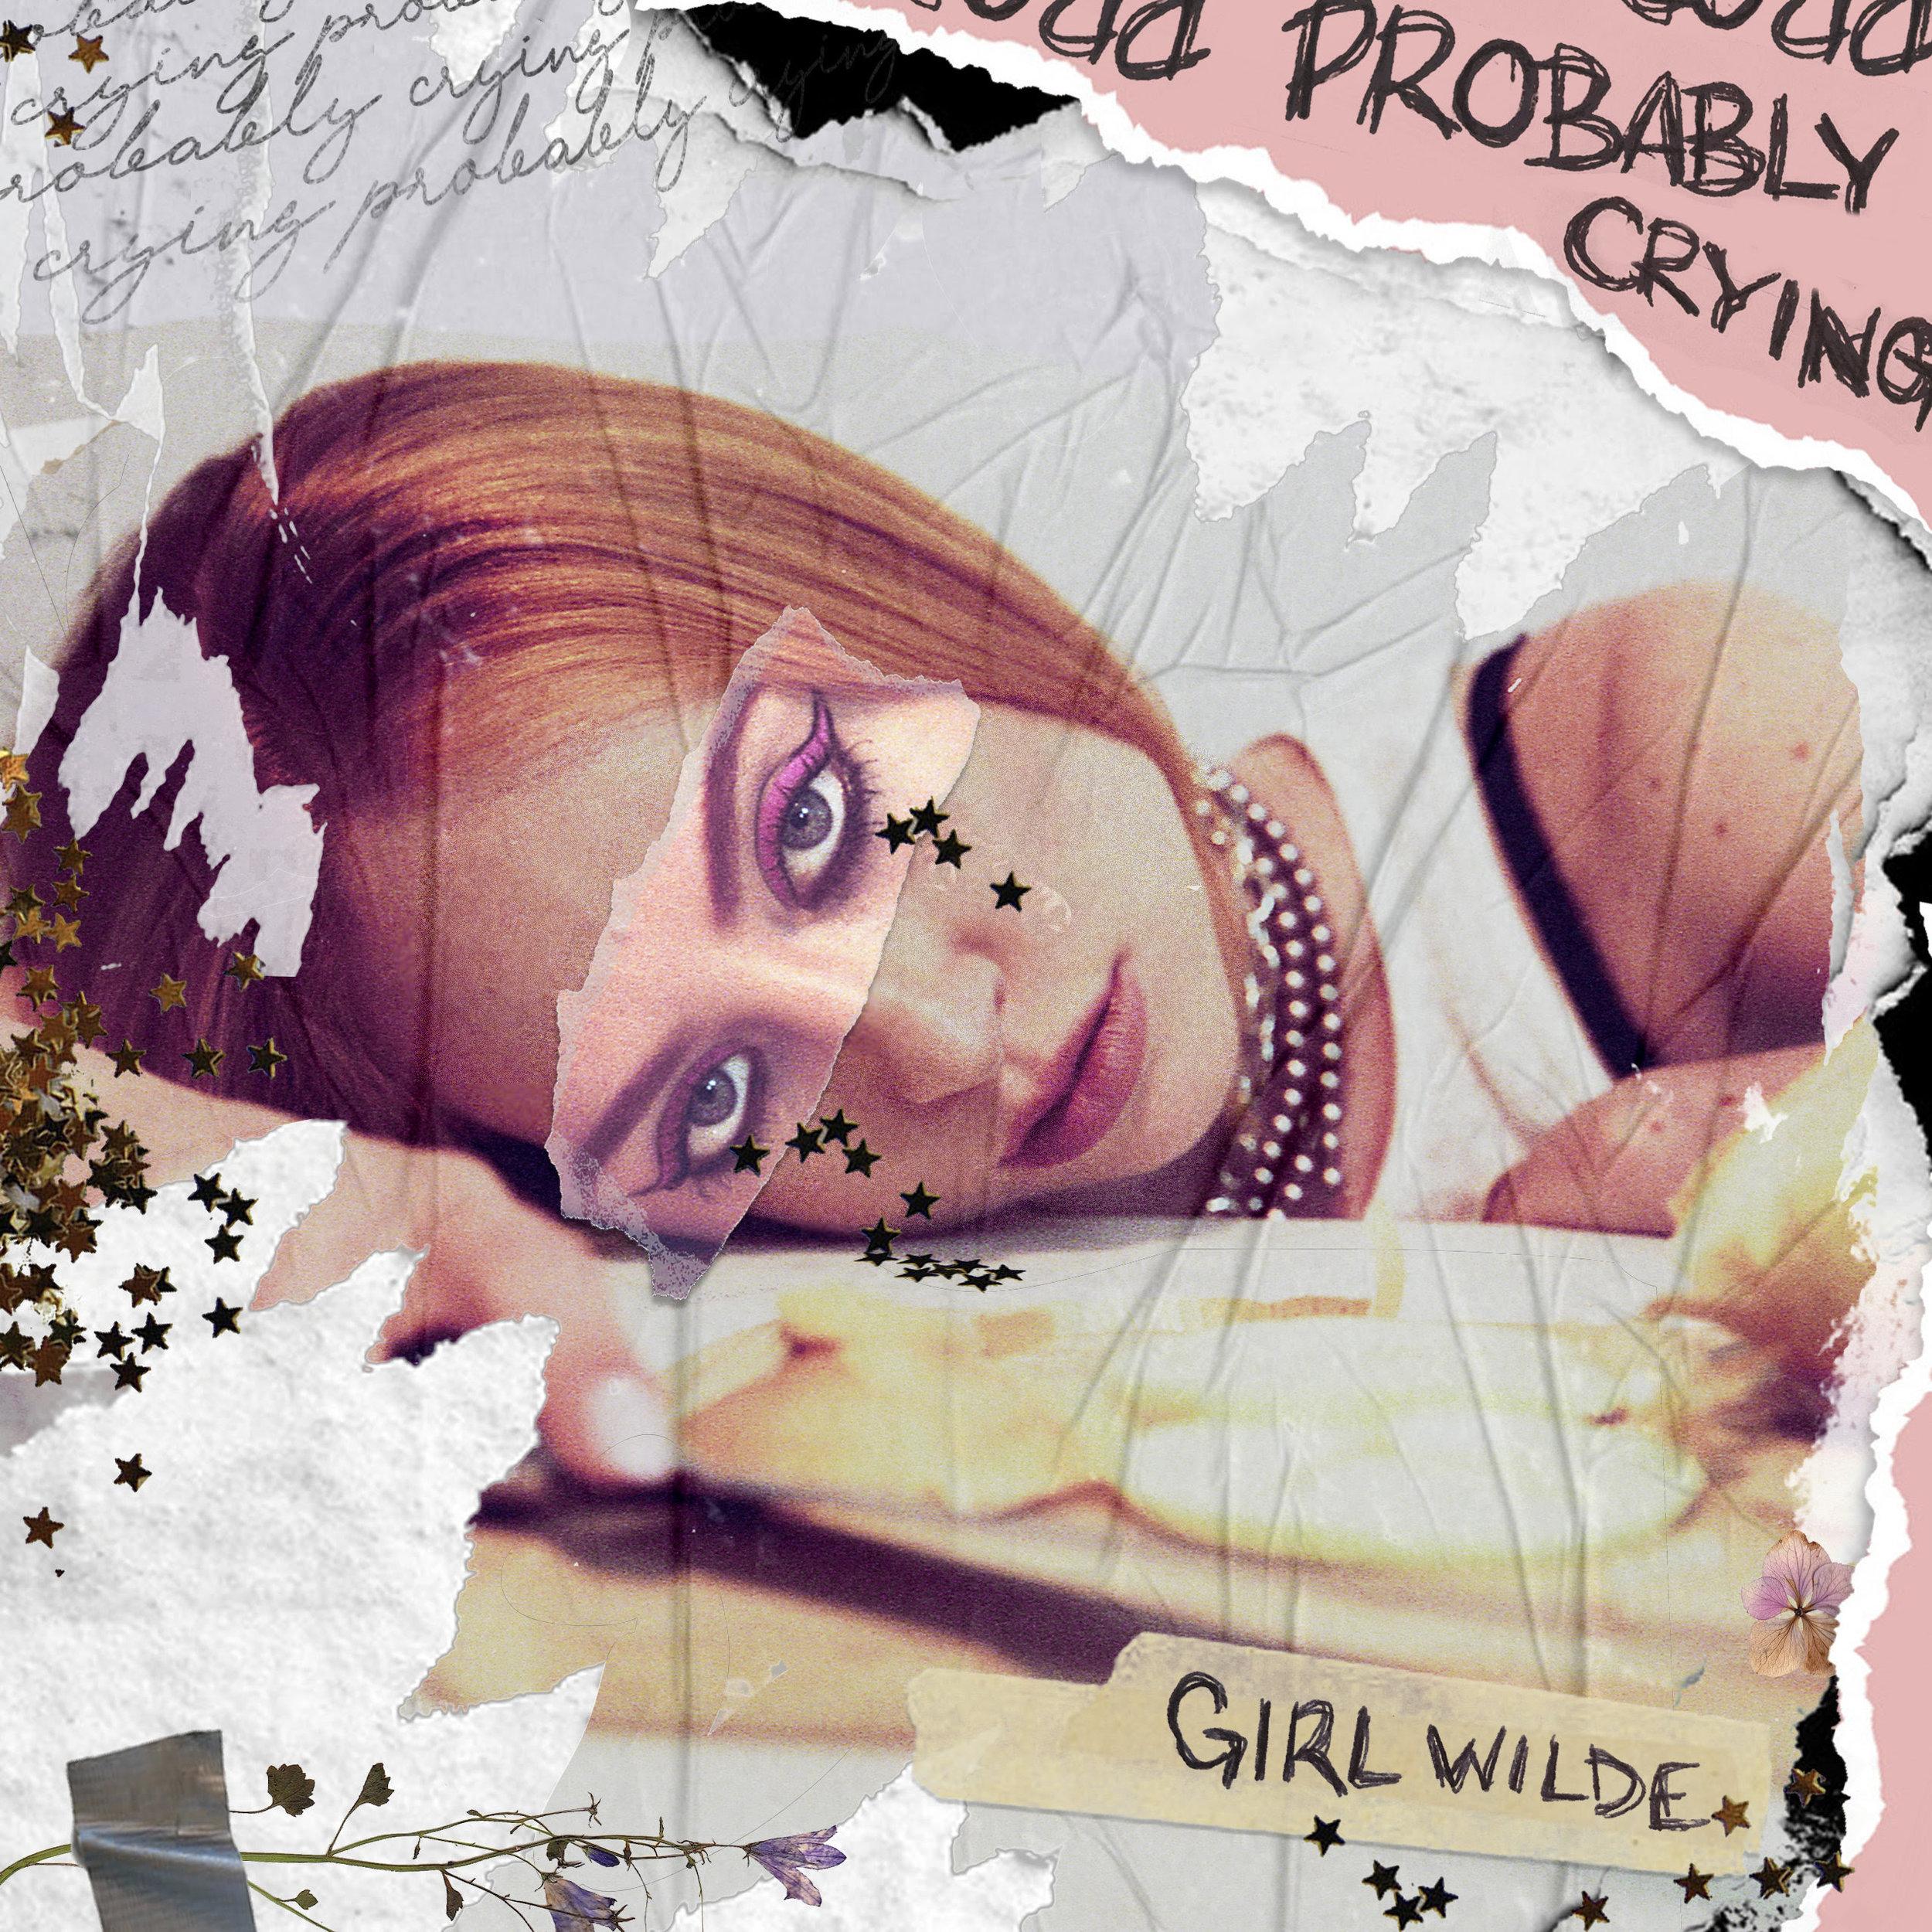 Girl Wilde-Probably Crying.jpg